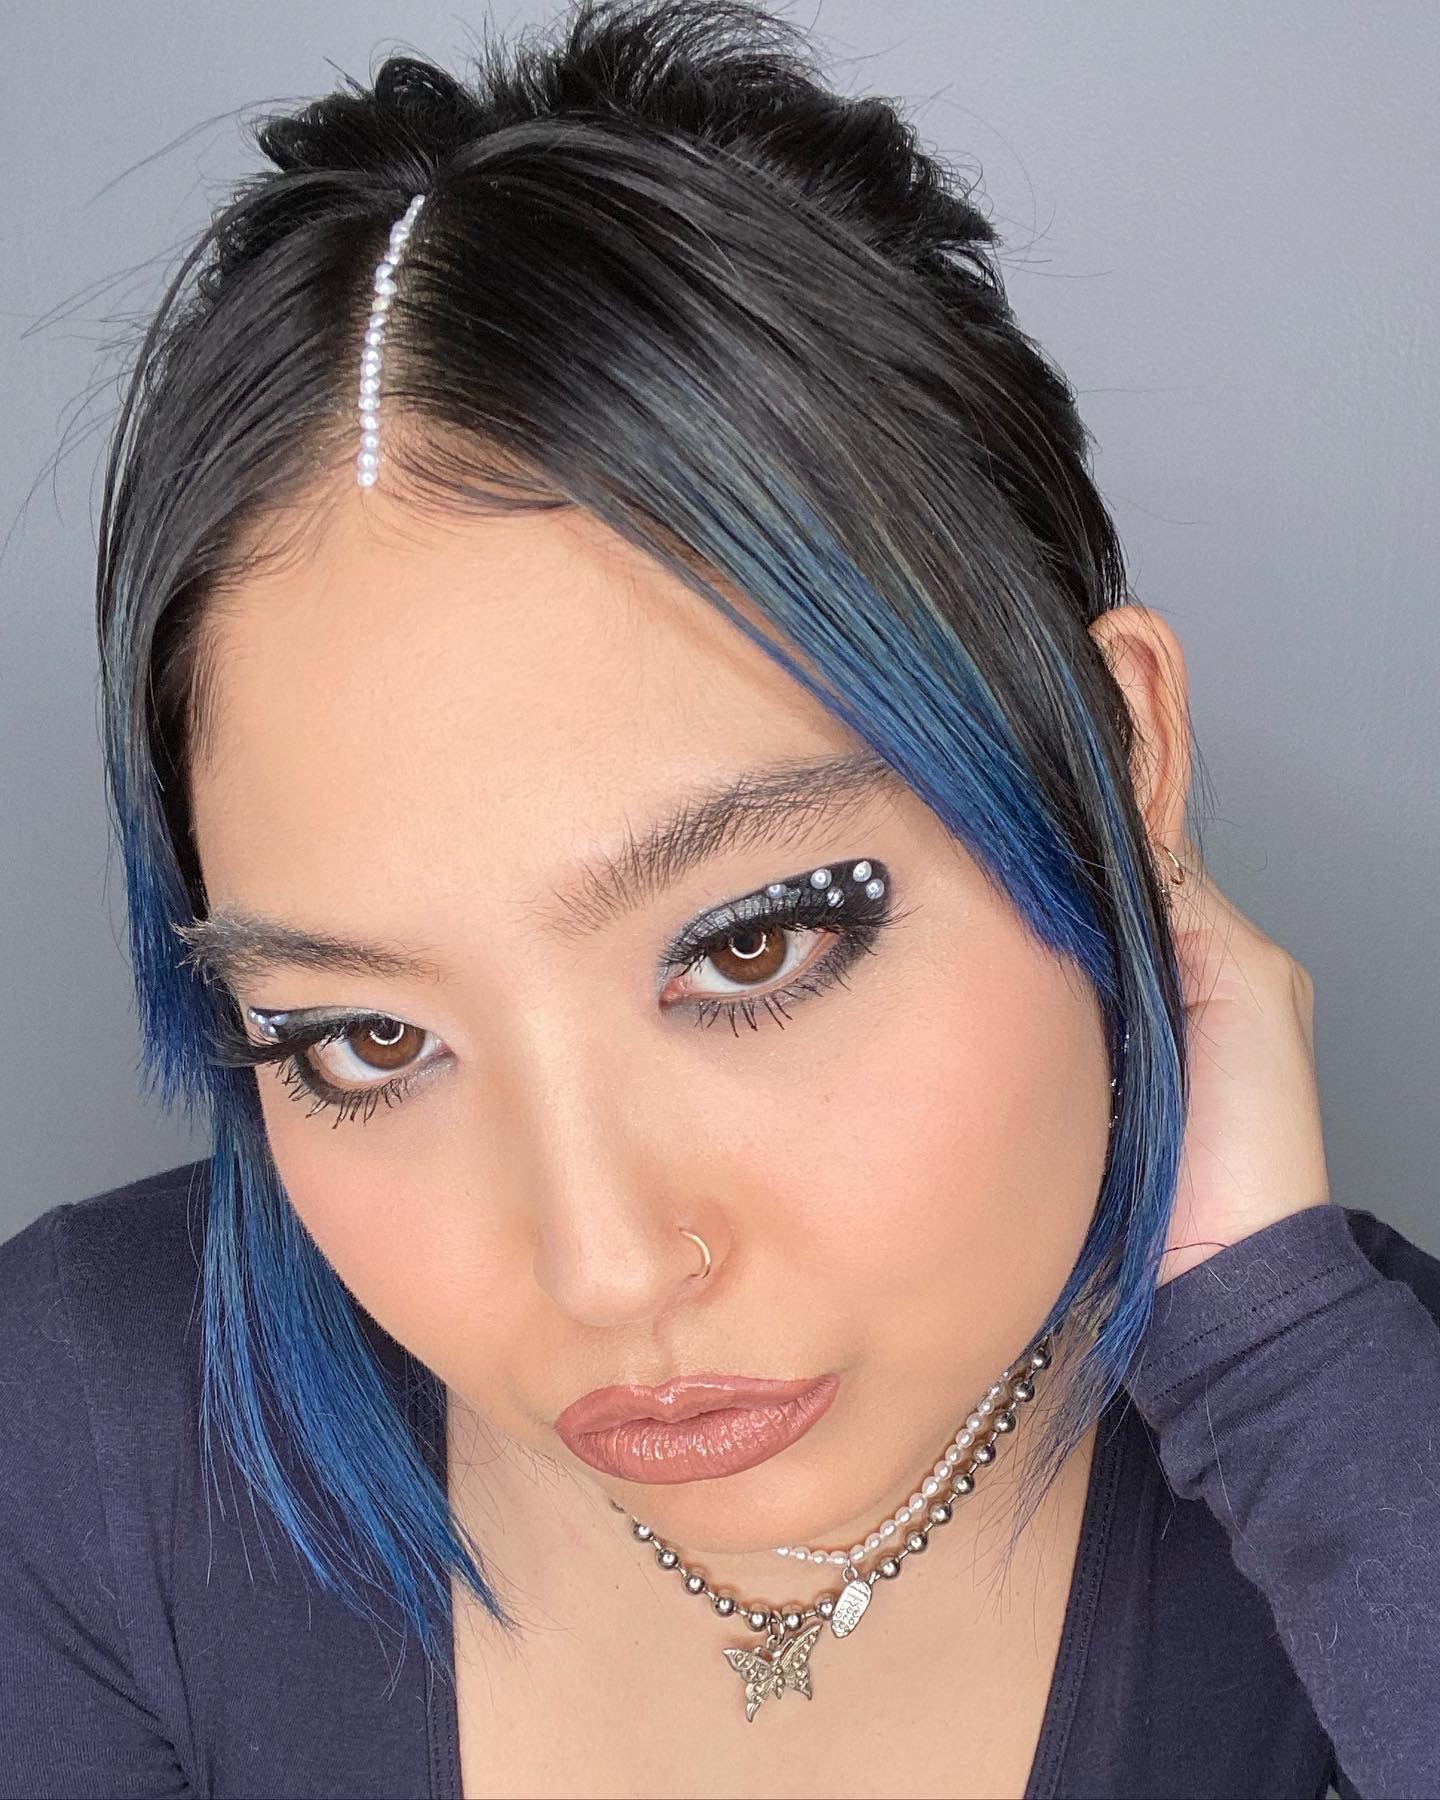 MaddyNation Alexa Demie Euphoria Makeup Look in 2020